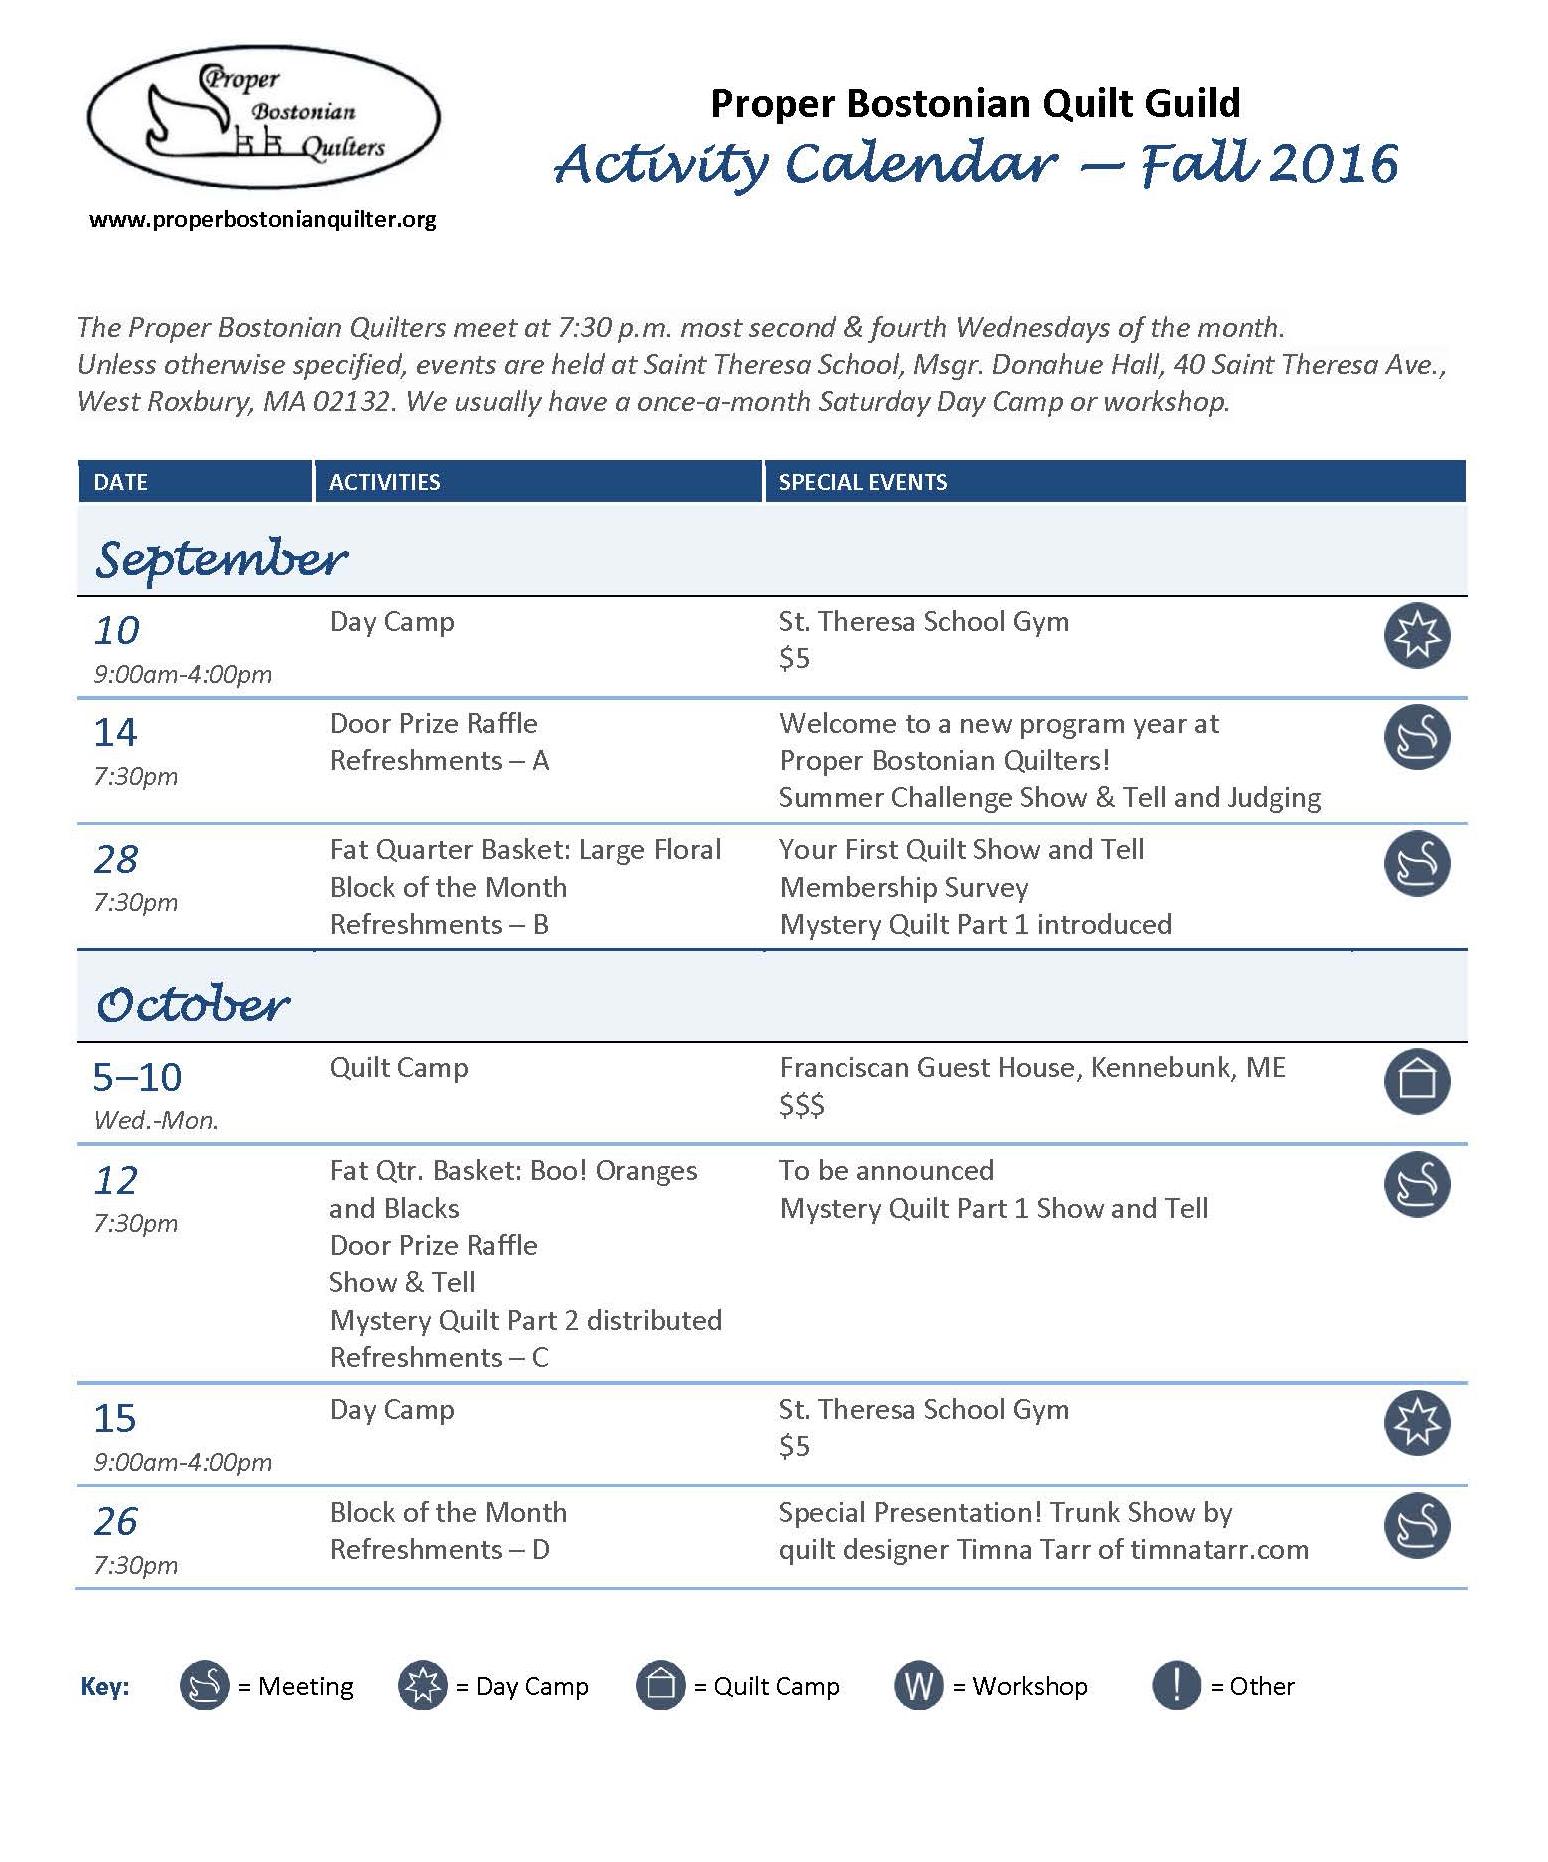 PBQ OFFICIAL CALENDAR Fall 2016_v4_P1